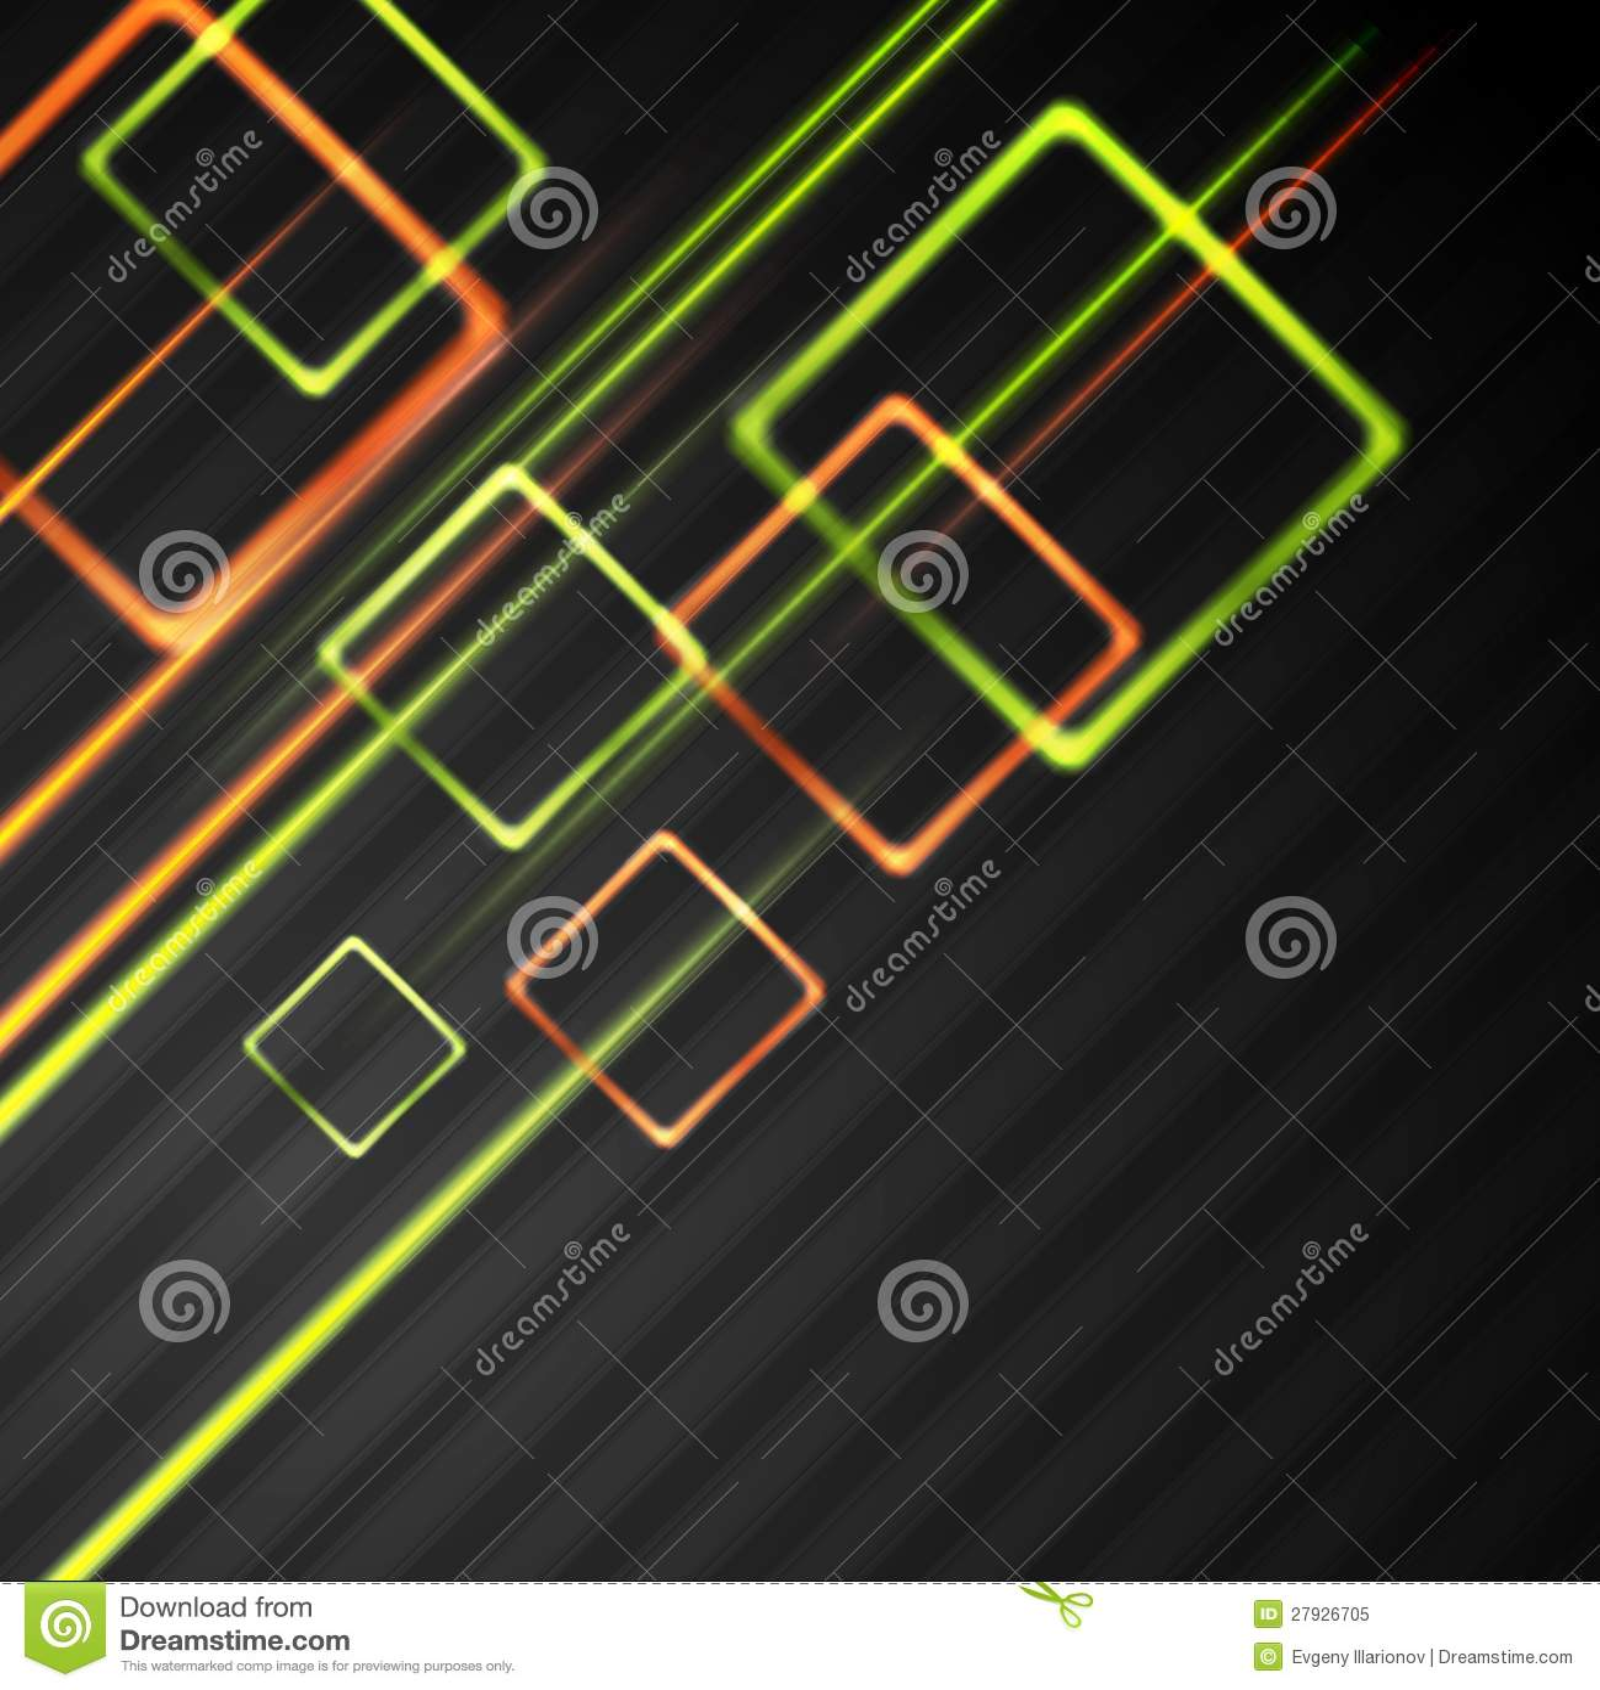 Shiny technology design. Vector